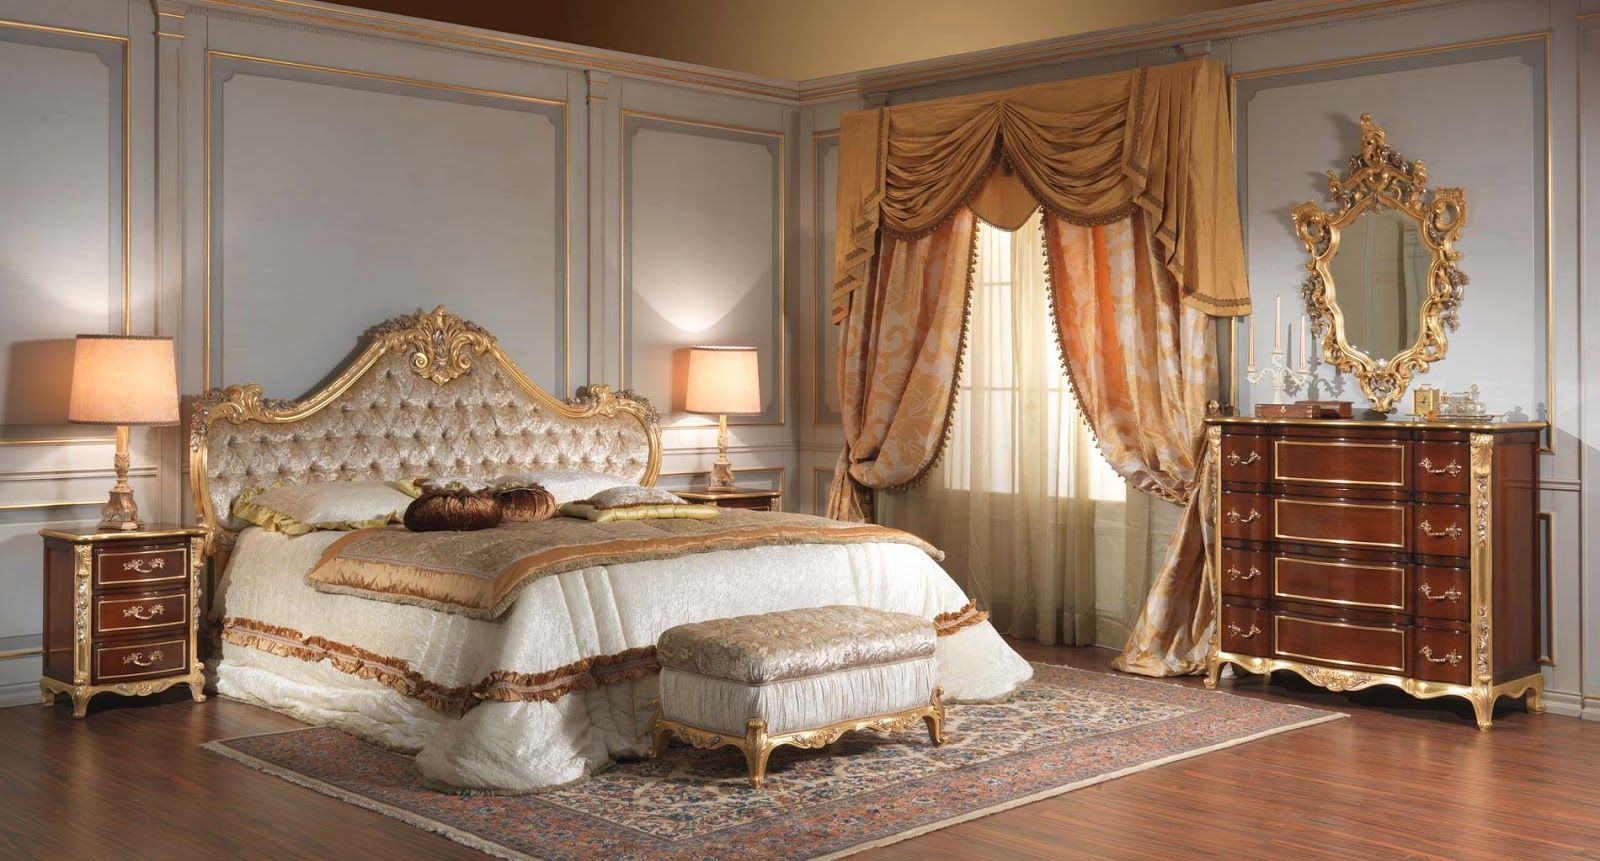 Dormitorios Matrimonio Clasicos Buscar Con Google Dormitorios  ~ Decorar Dormitorios De Matrimonio